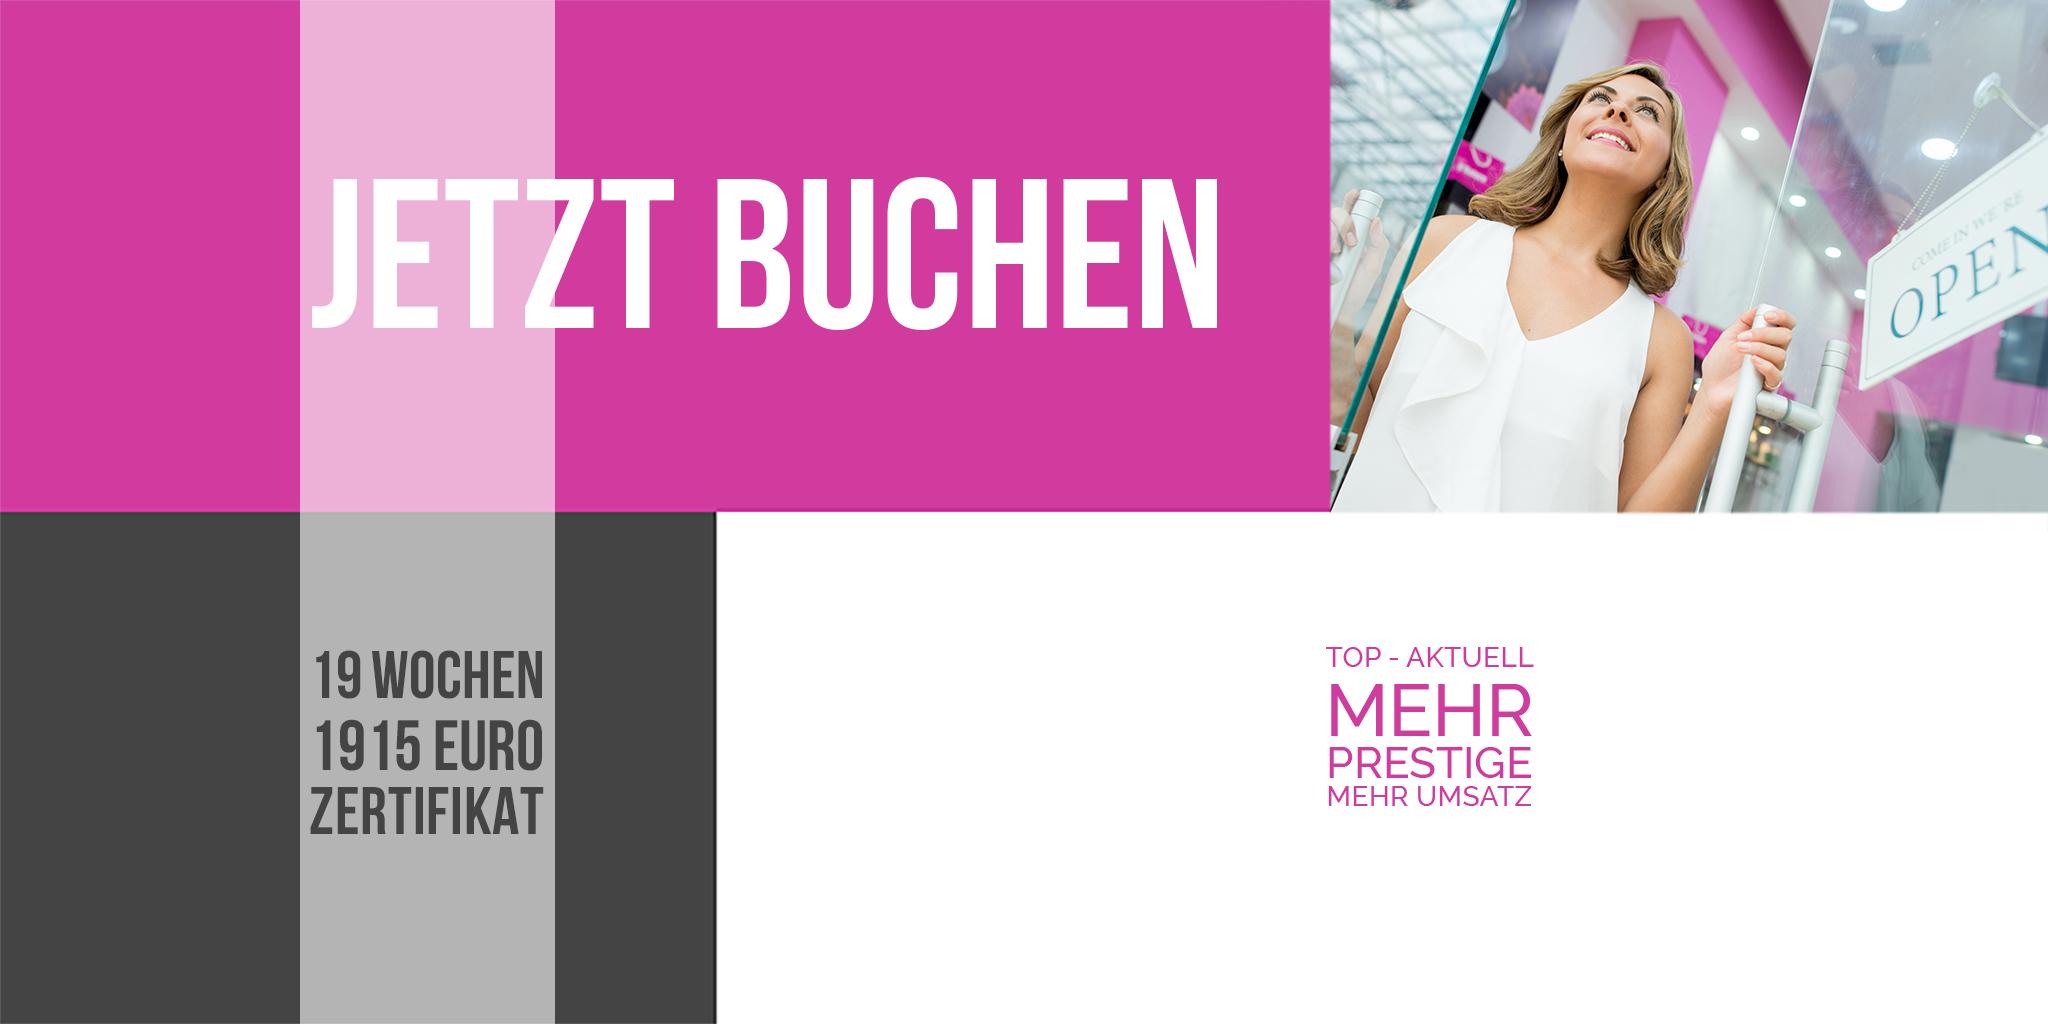 Ausbildung Design Berlin kosmetik ausbildung berlin reks kosmetik schule